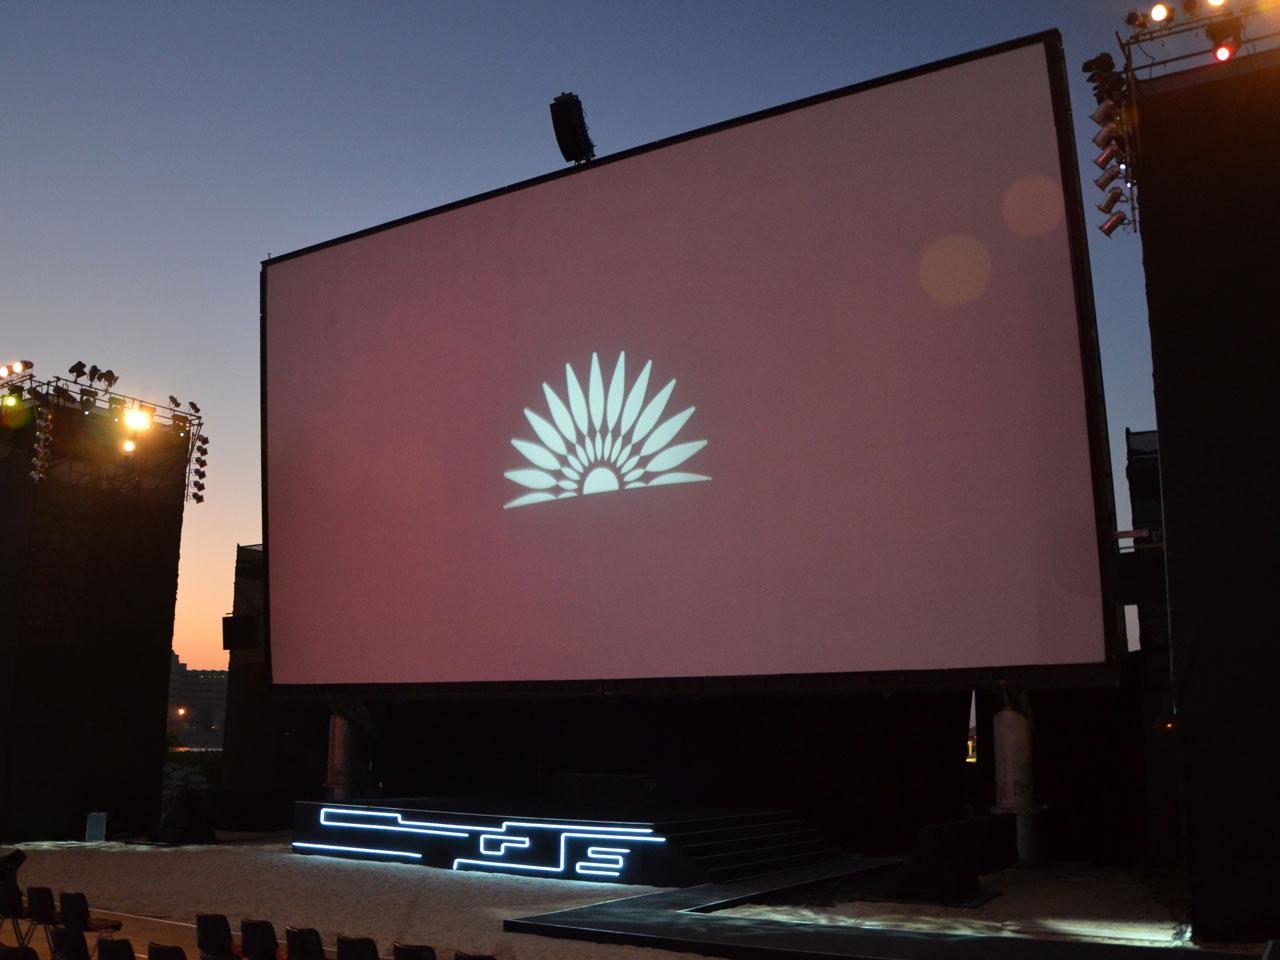 grandstand-seats-events-setup-rental-stadium-seating-sport-management-film-festival-seating-screening-f1-open-air-cinema-33